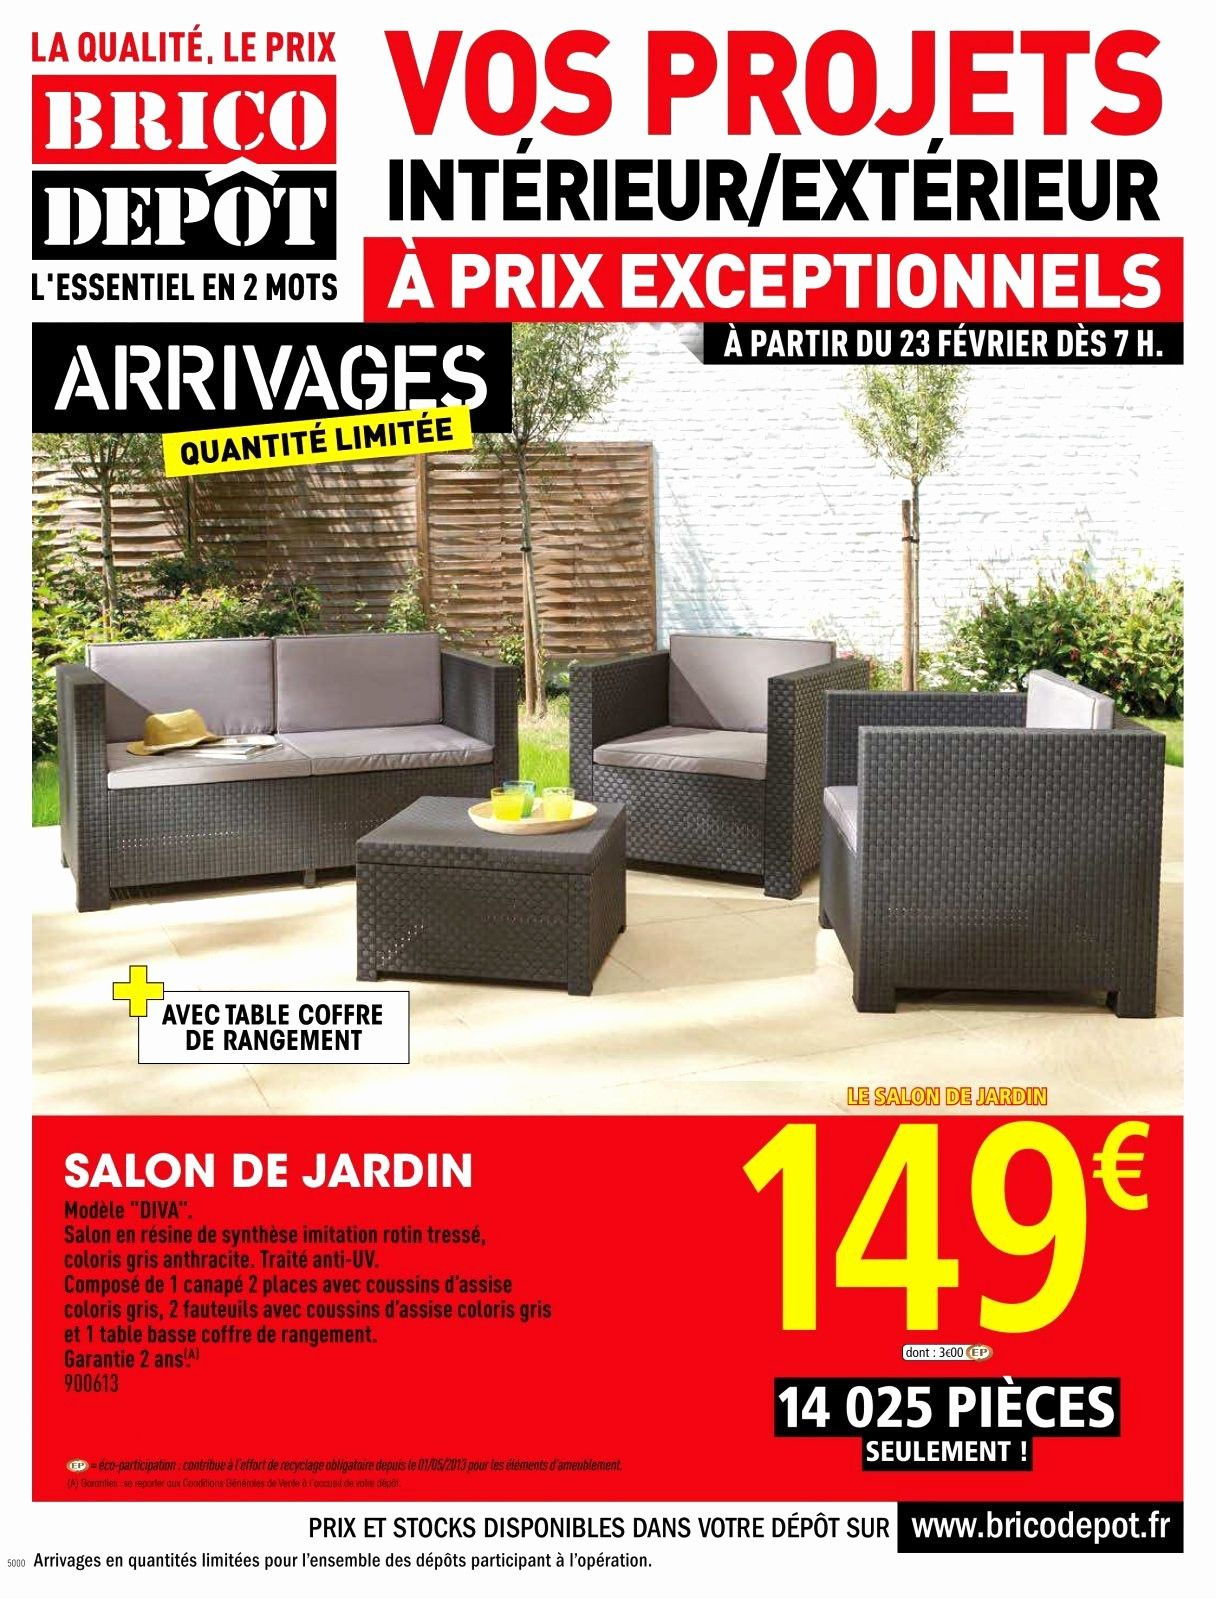 Elegant Barriere De Securite Brico Depot | Salon De Jardin ... dedans Mobilier Jardin Brico Depot